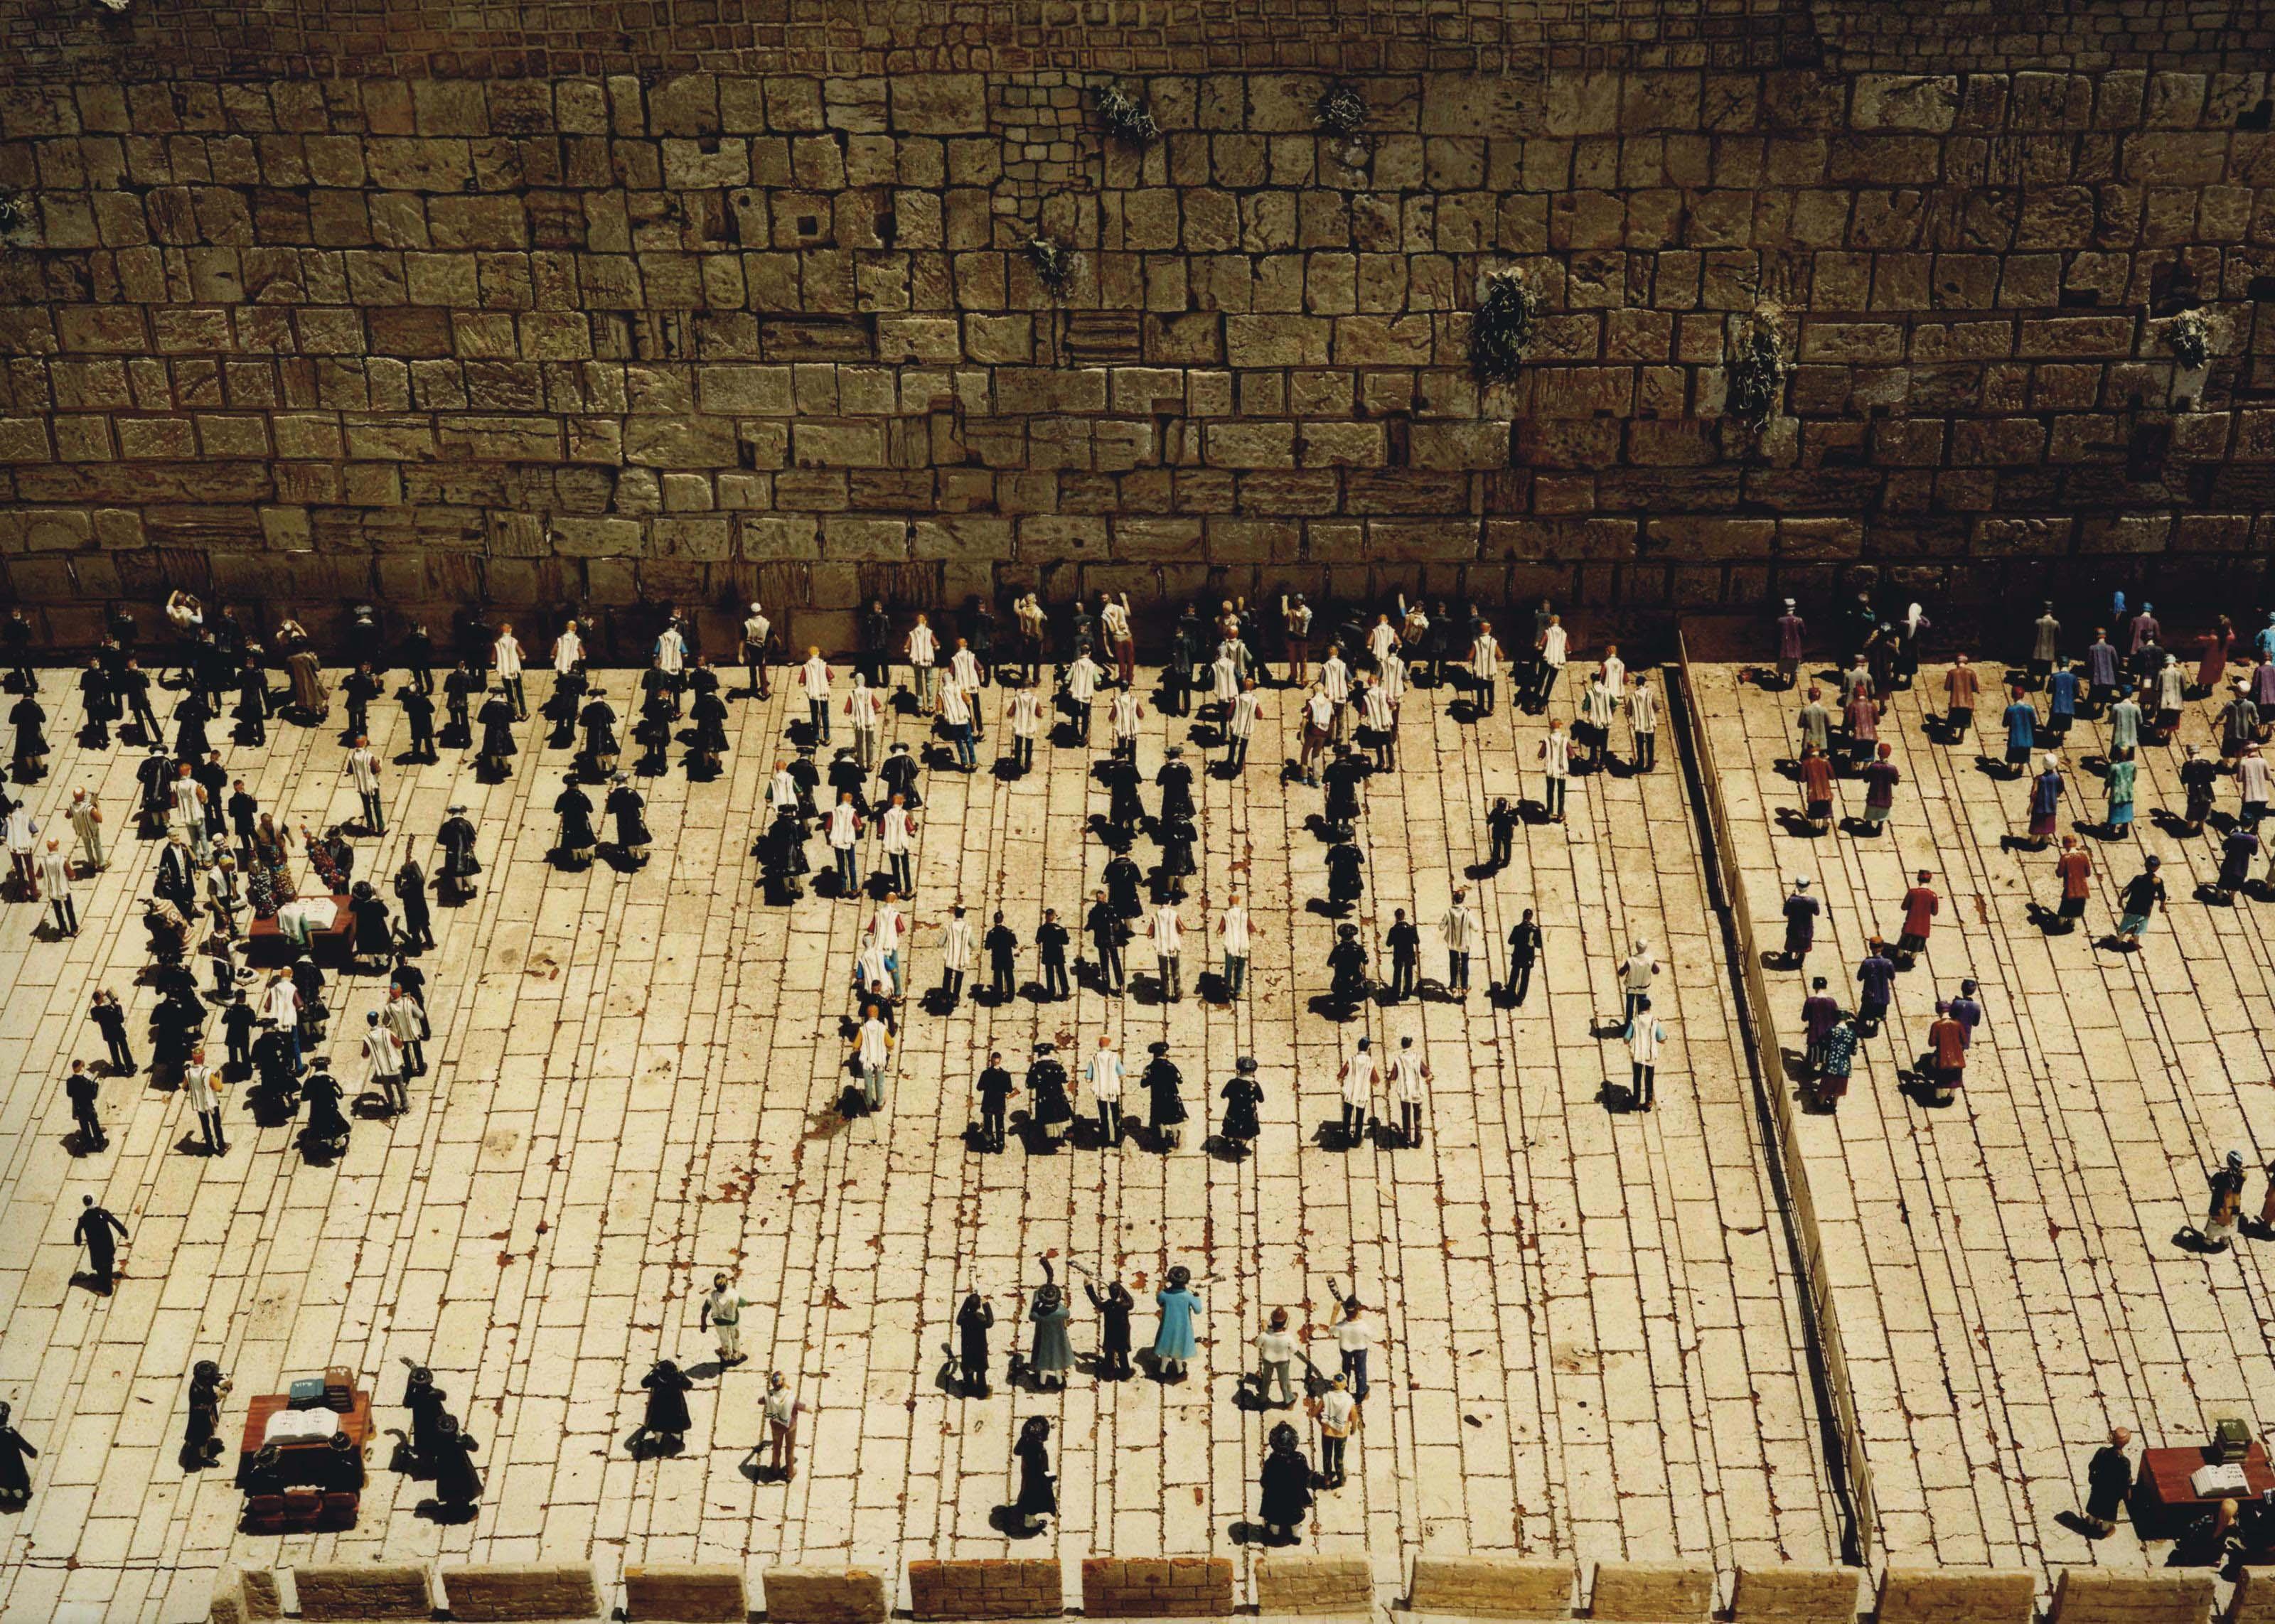 The Wailing Wall, Jerusalem, Mini Israel, Latrun, Israel, 2007